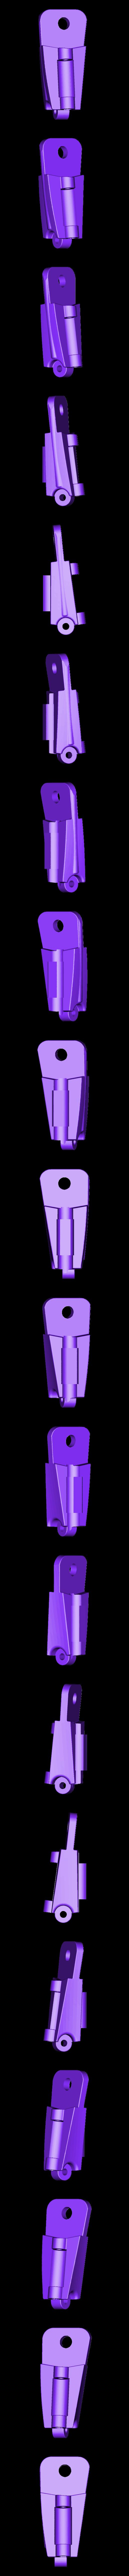 base_m%C3%A9tacarpes_-_majeur___-_Mod.stl Download free STL file Articulated hand • 3D printer model, NOP21